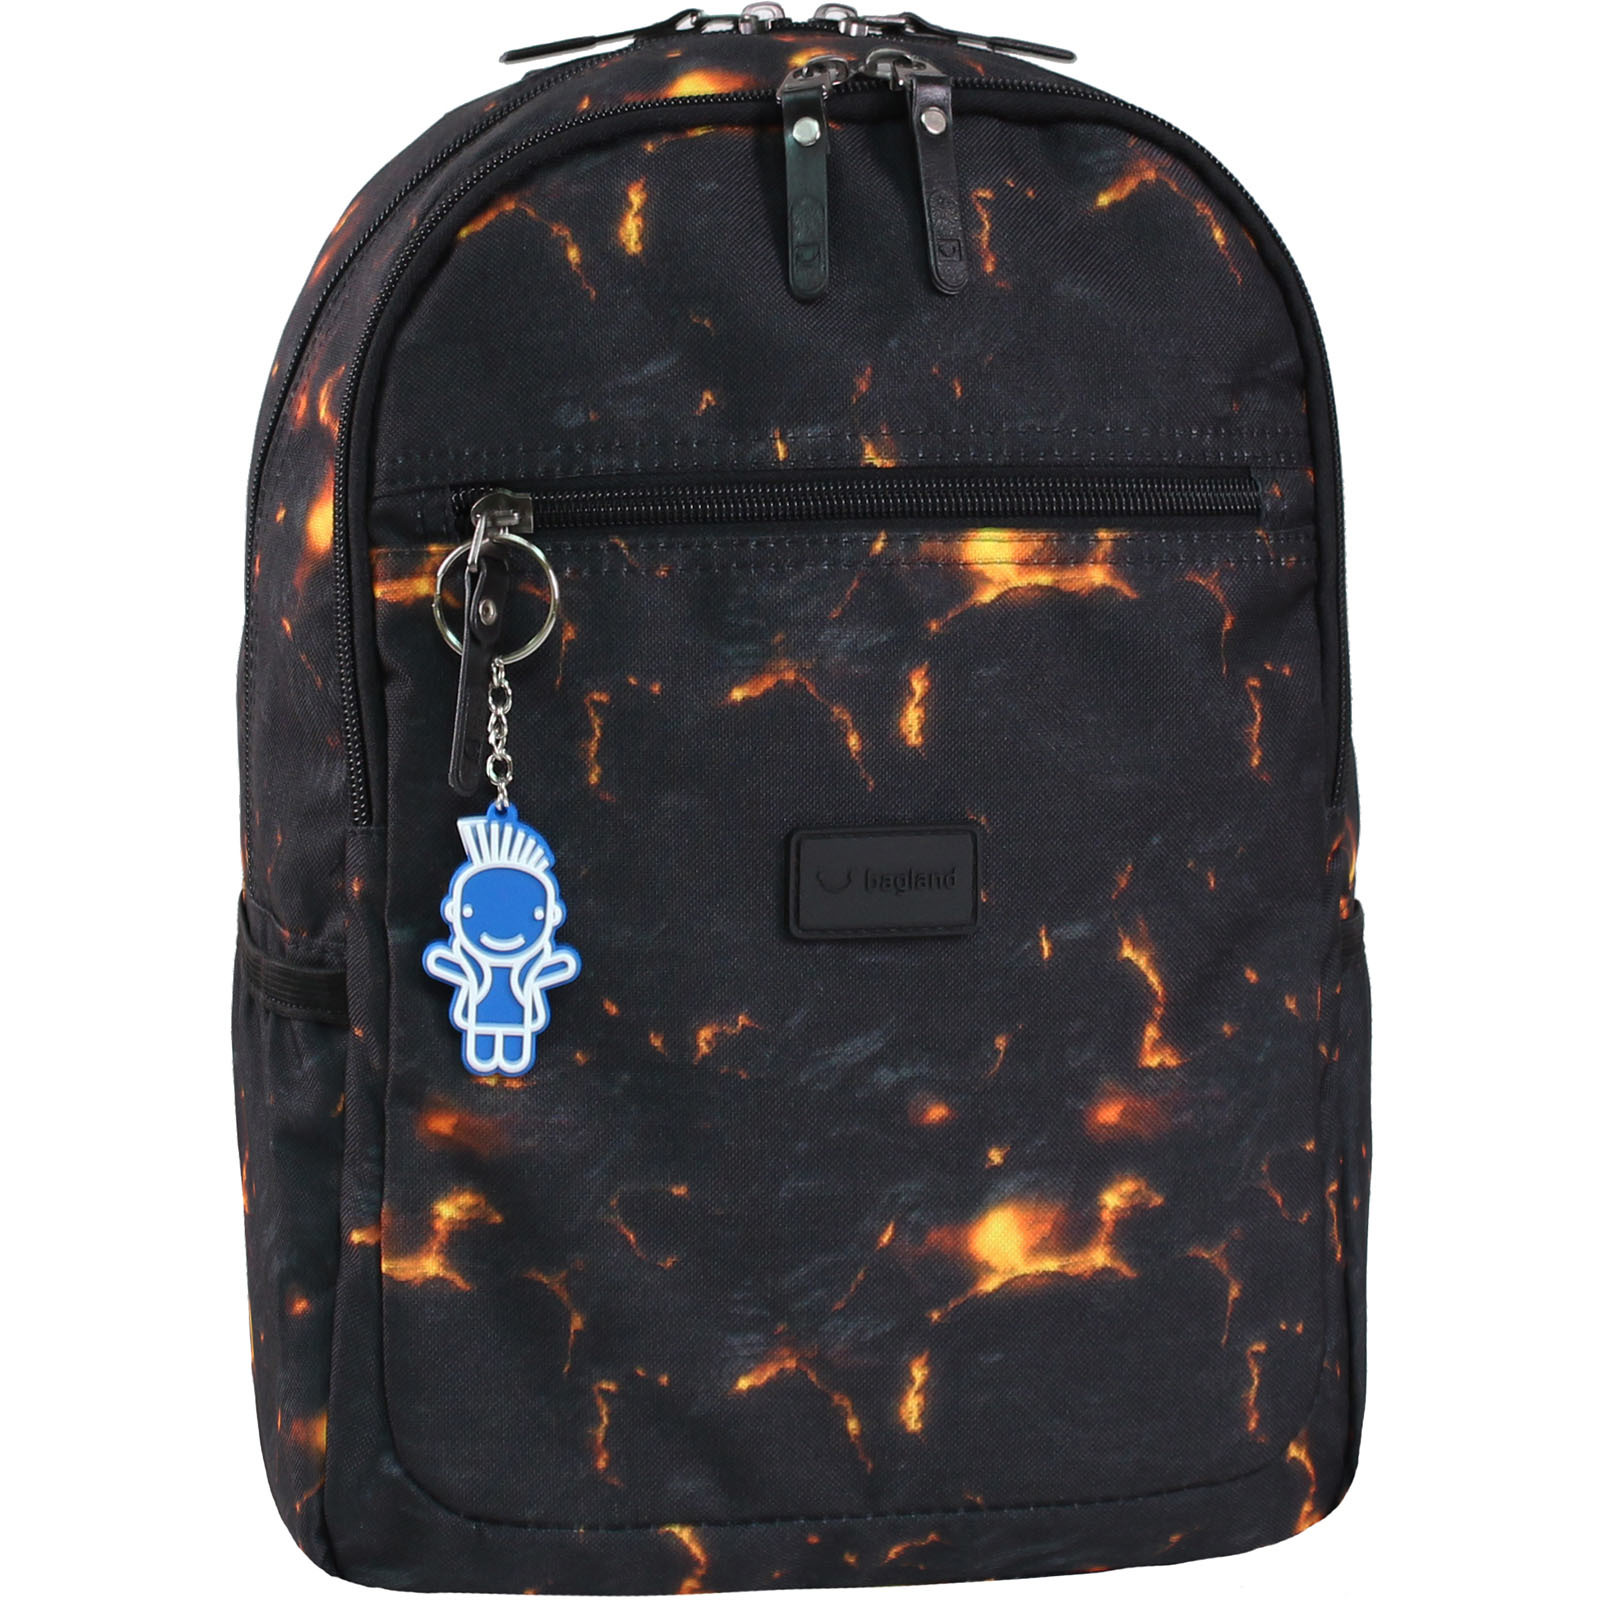 Детские рюкзаки Рюкзак Bagland Young 13 л. сублімація 83 (00510664) IMG_8706_83.JPG